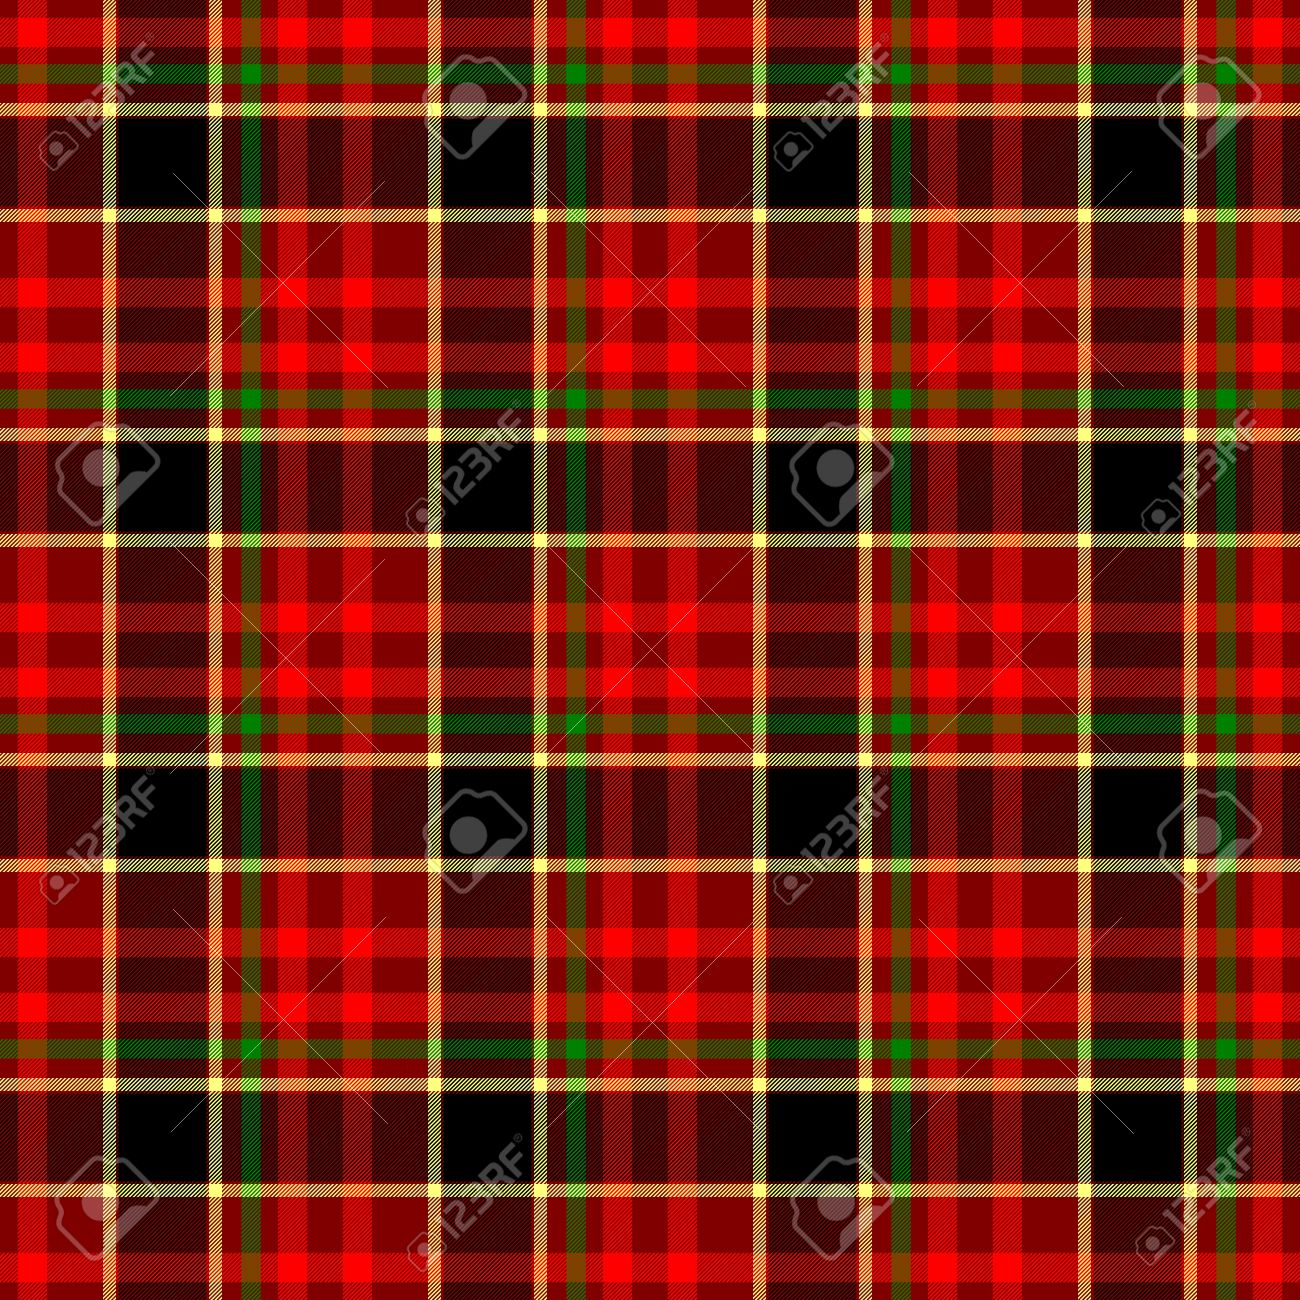 Red Yellow Green Check Diamond Tartan Scot Plaid Fabric Material Seamless  Pattern Texture Background Stock Photo